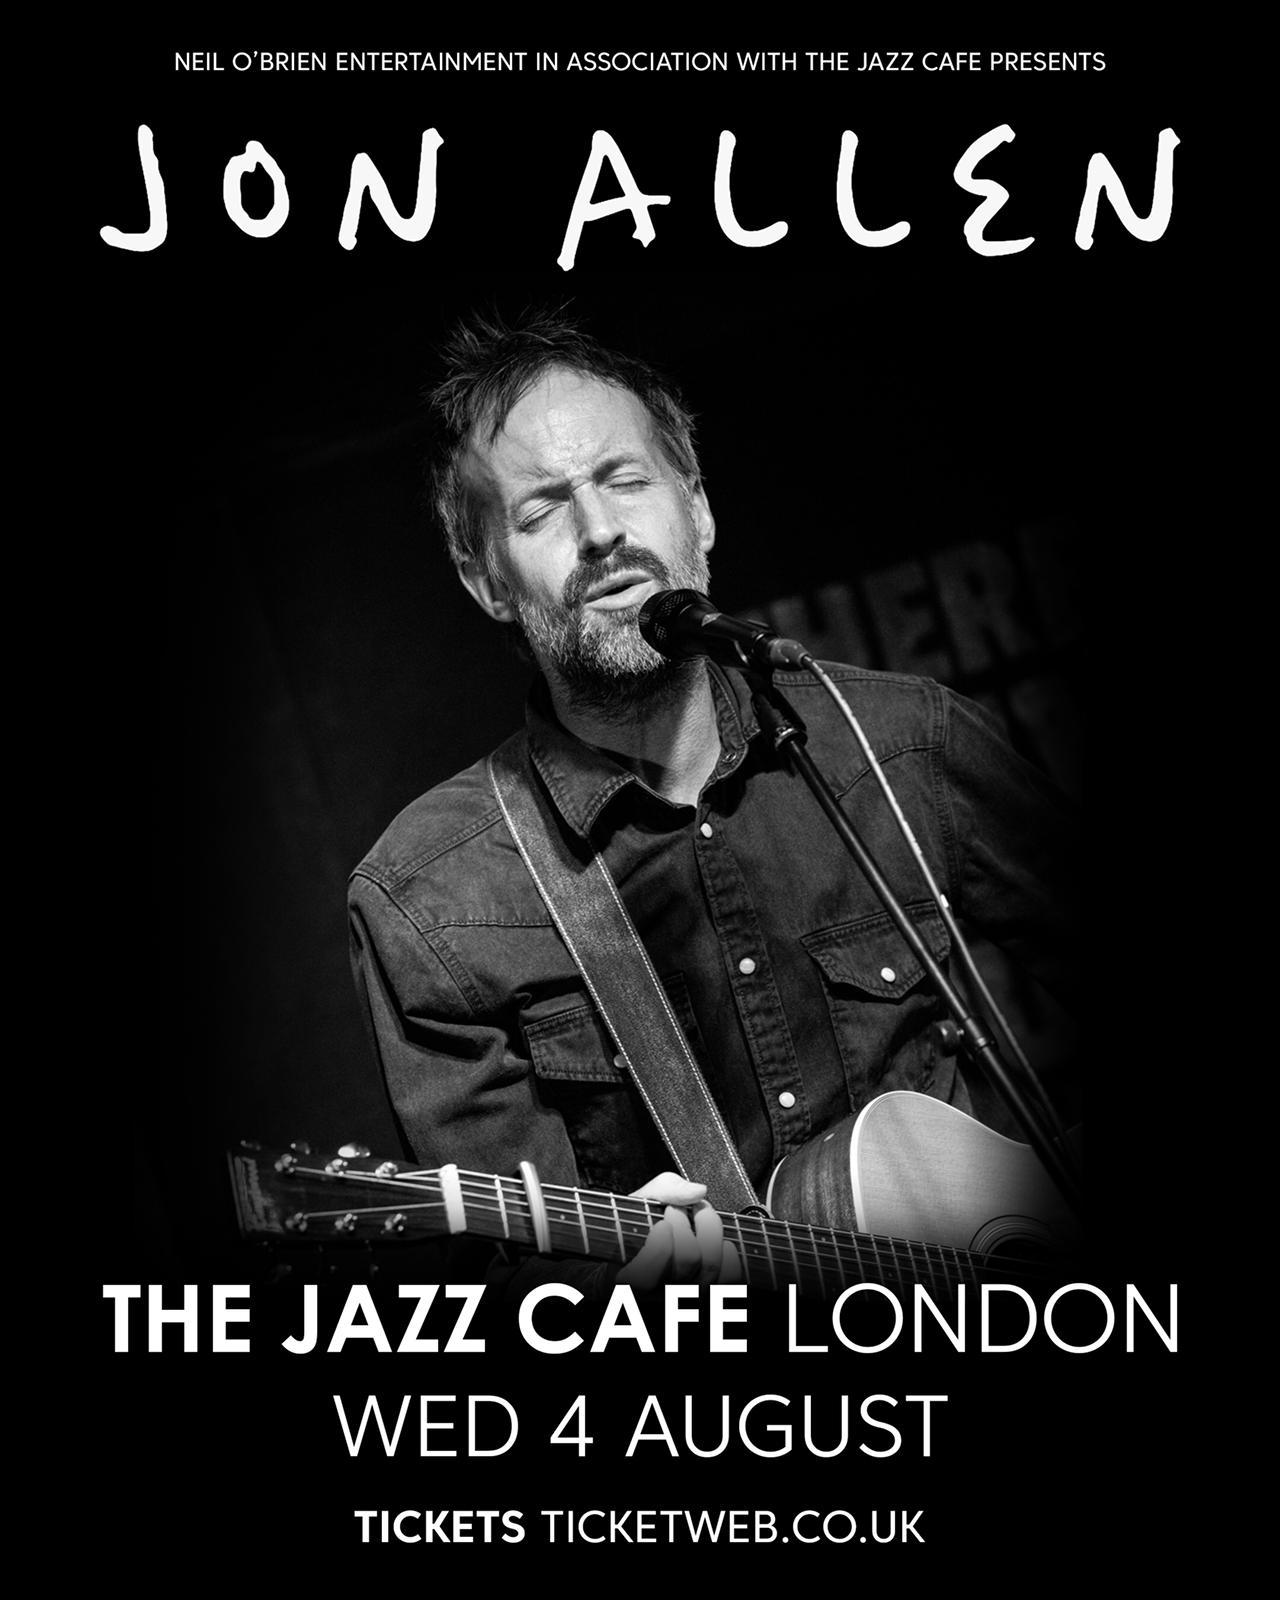 Jon Allen - Live at The Jazz Cafe - 4 Aug 2021